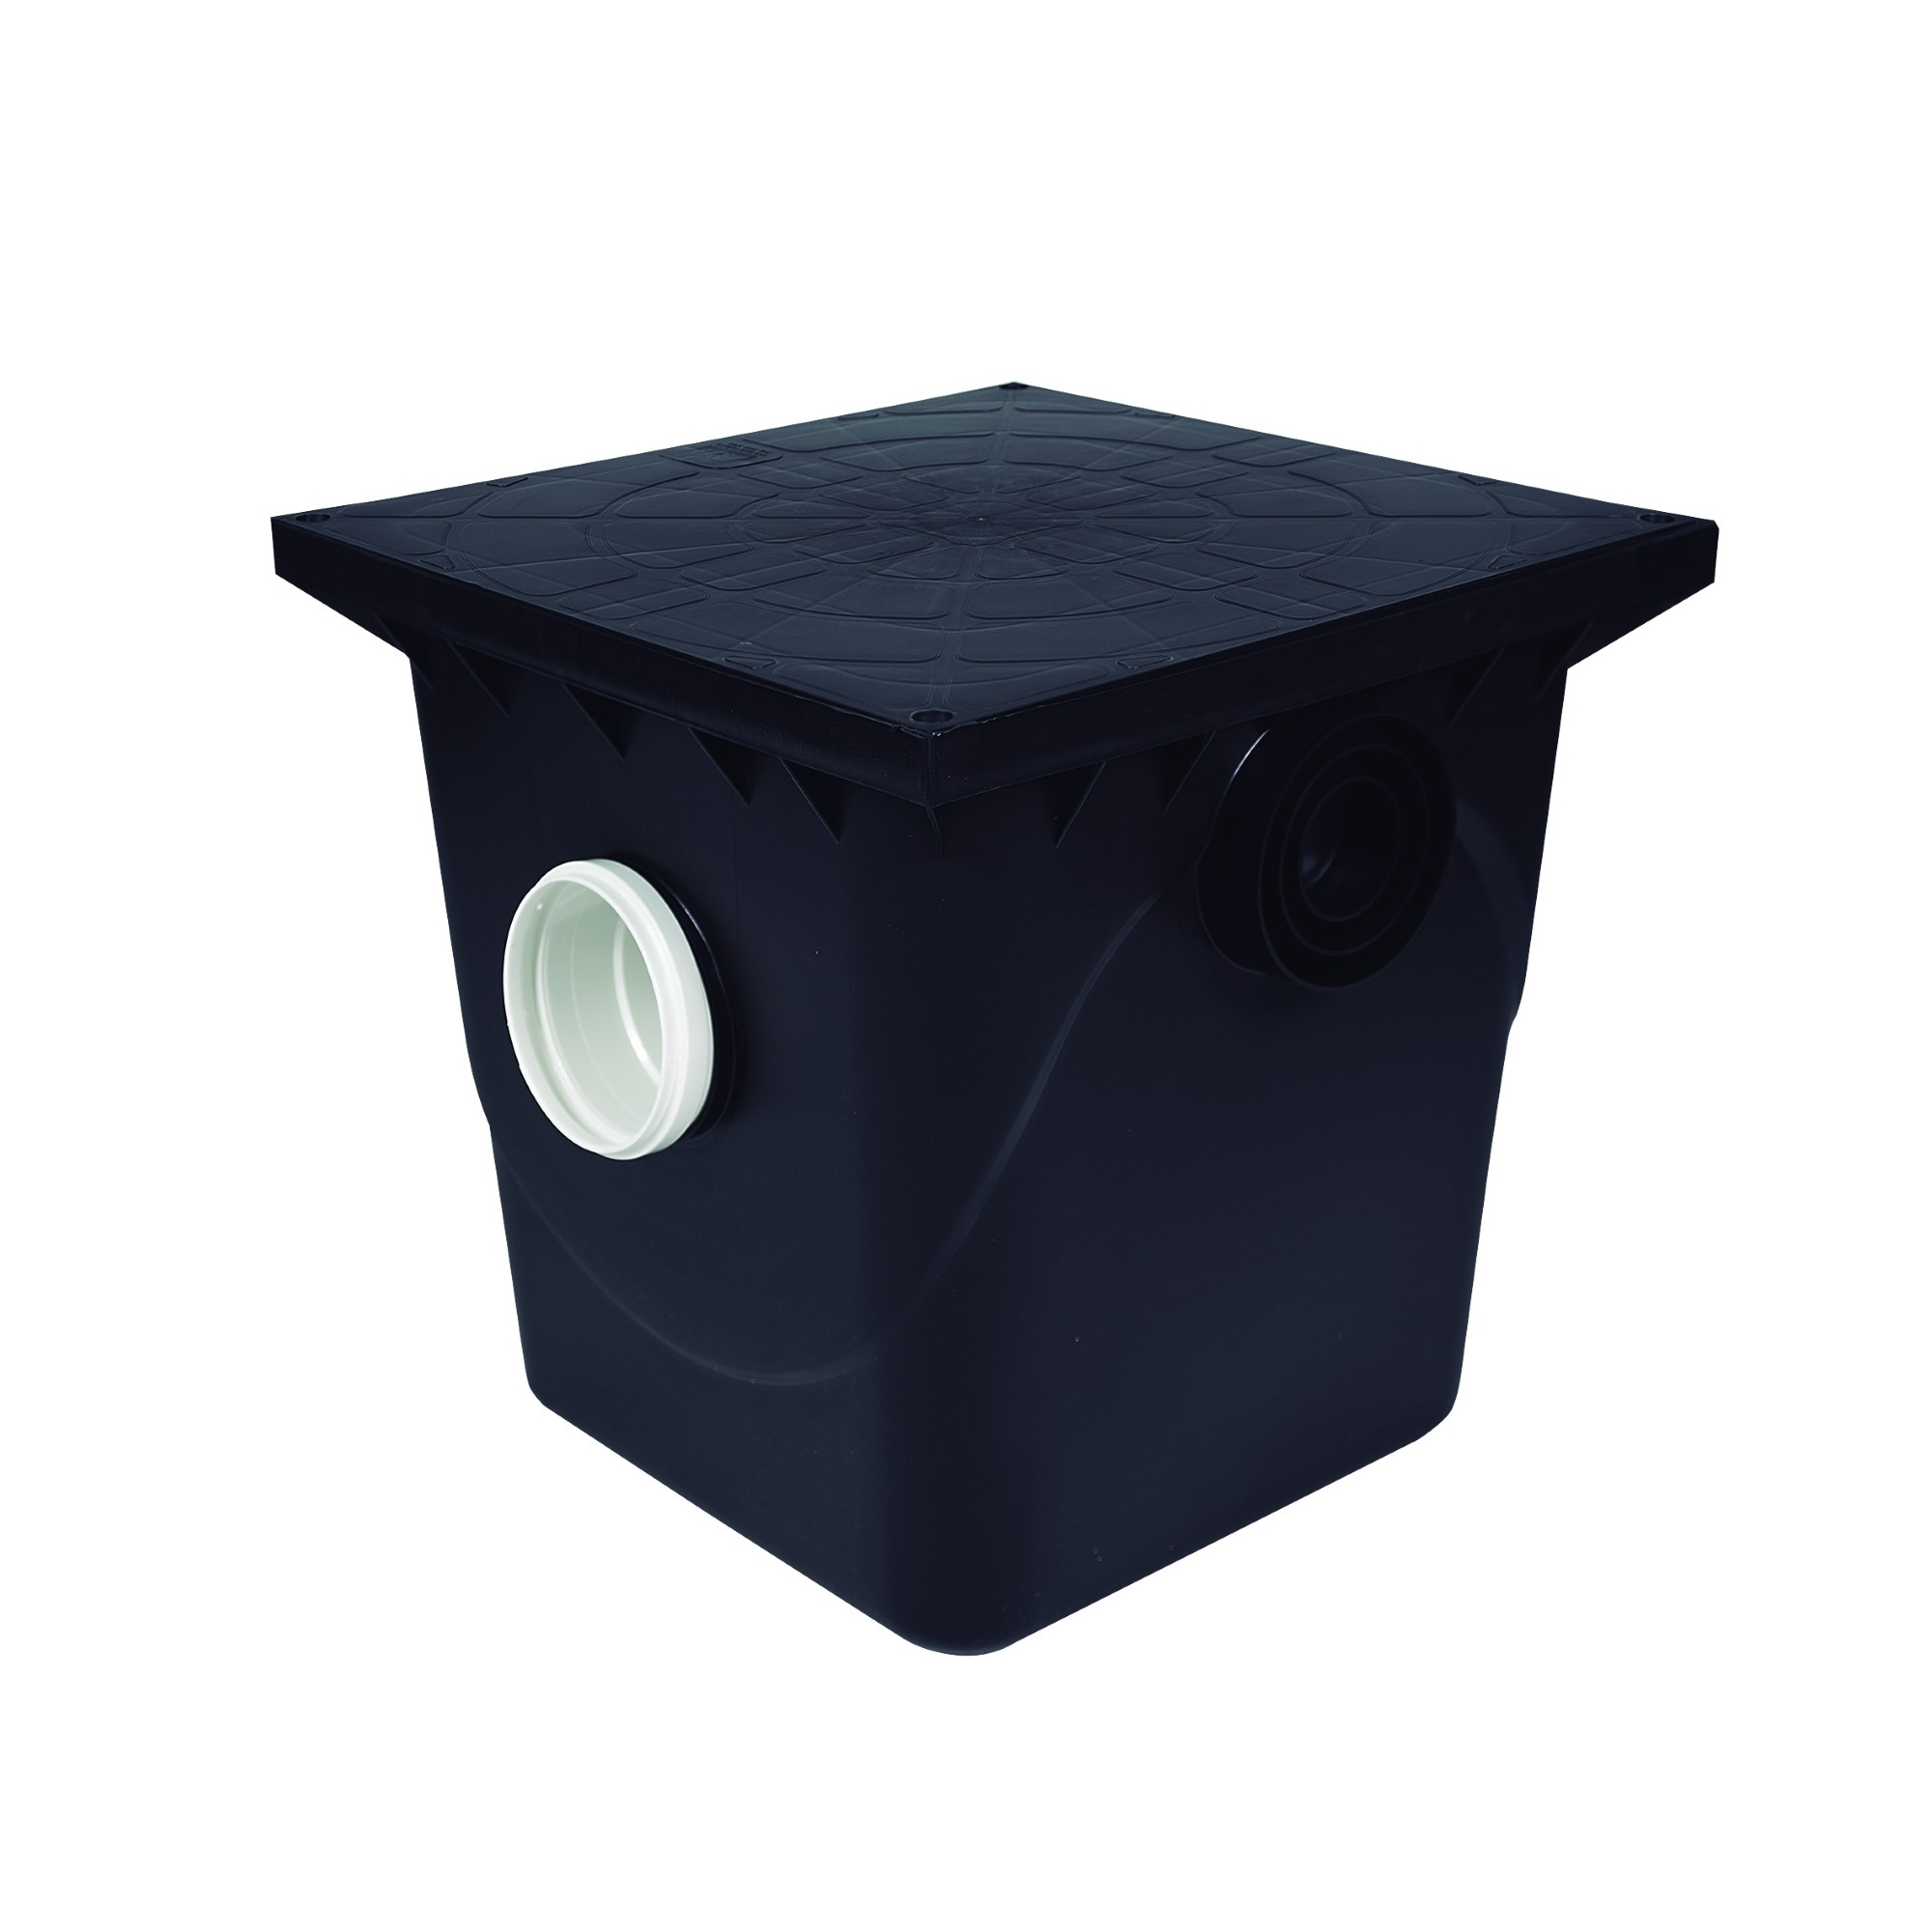 Caixa para Gordura PVC 05501 - Metasul